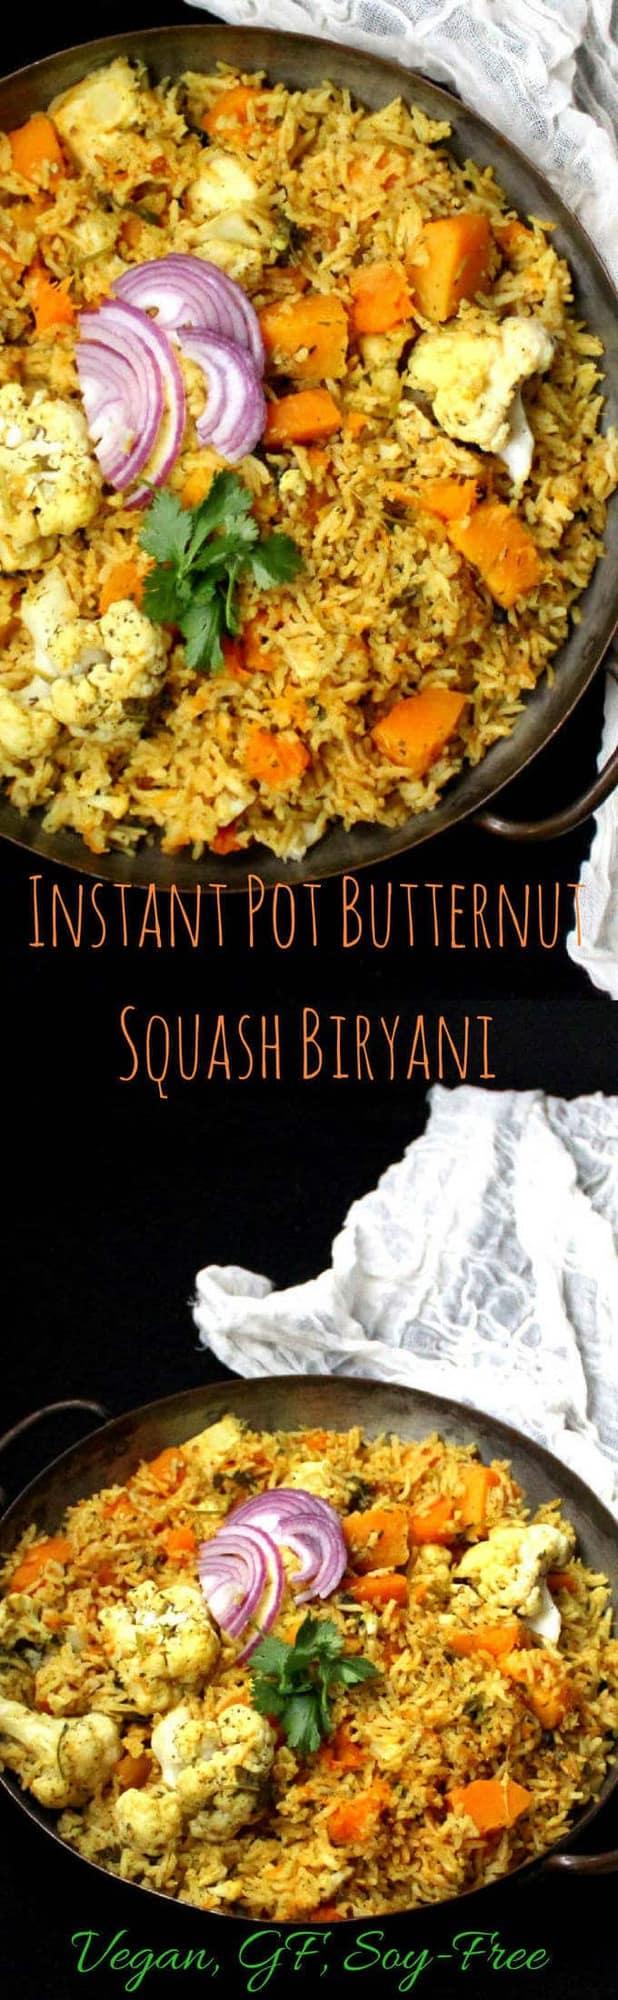 Instant Pot Butternut Squash Biryani - HolyCowVegan.net